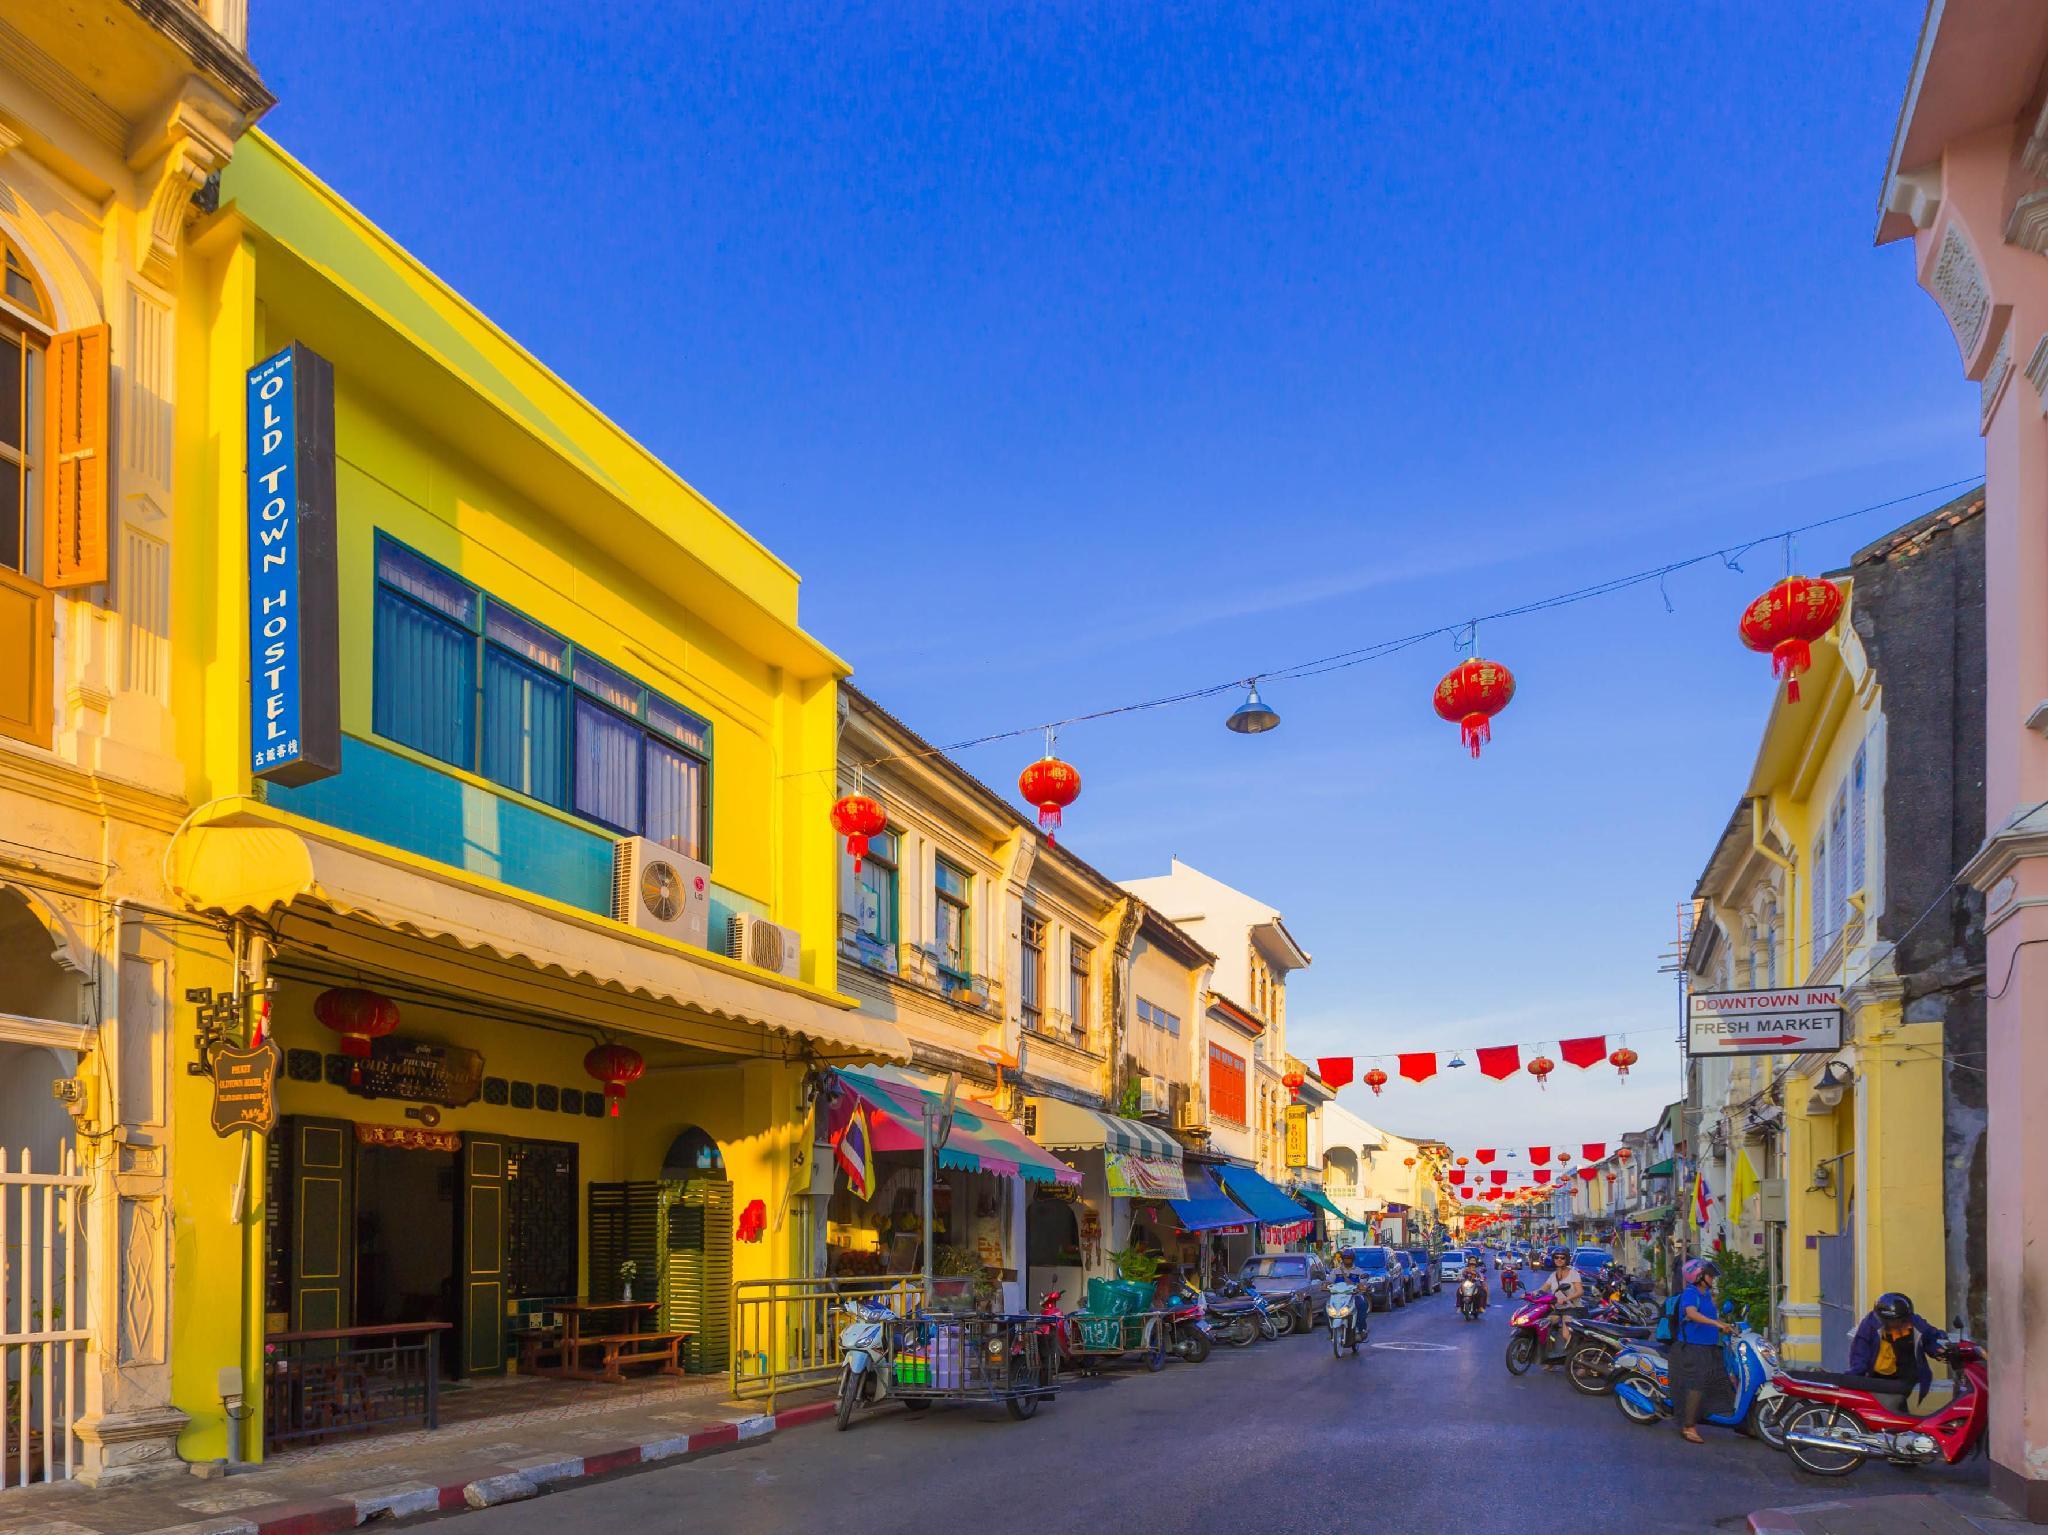 Phuket Old Town Hostel,ภูเก็ต โอลด์ทาวน์ โฮสเทล